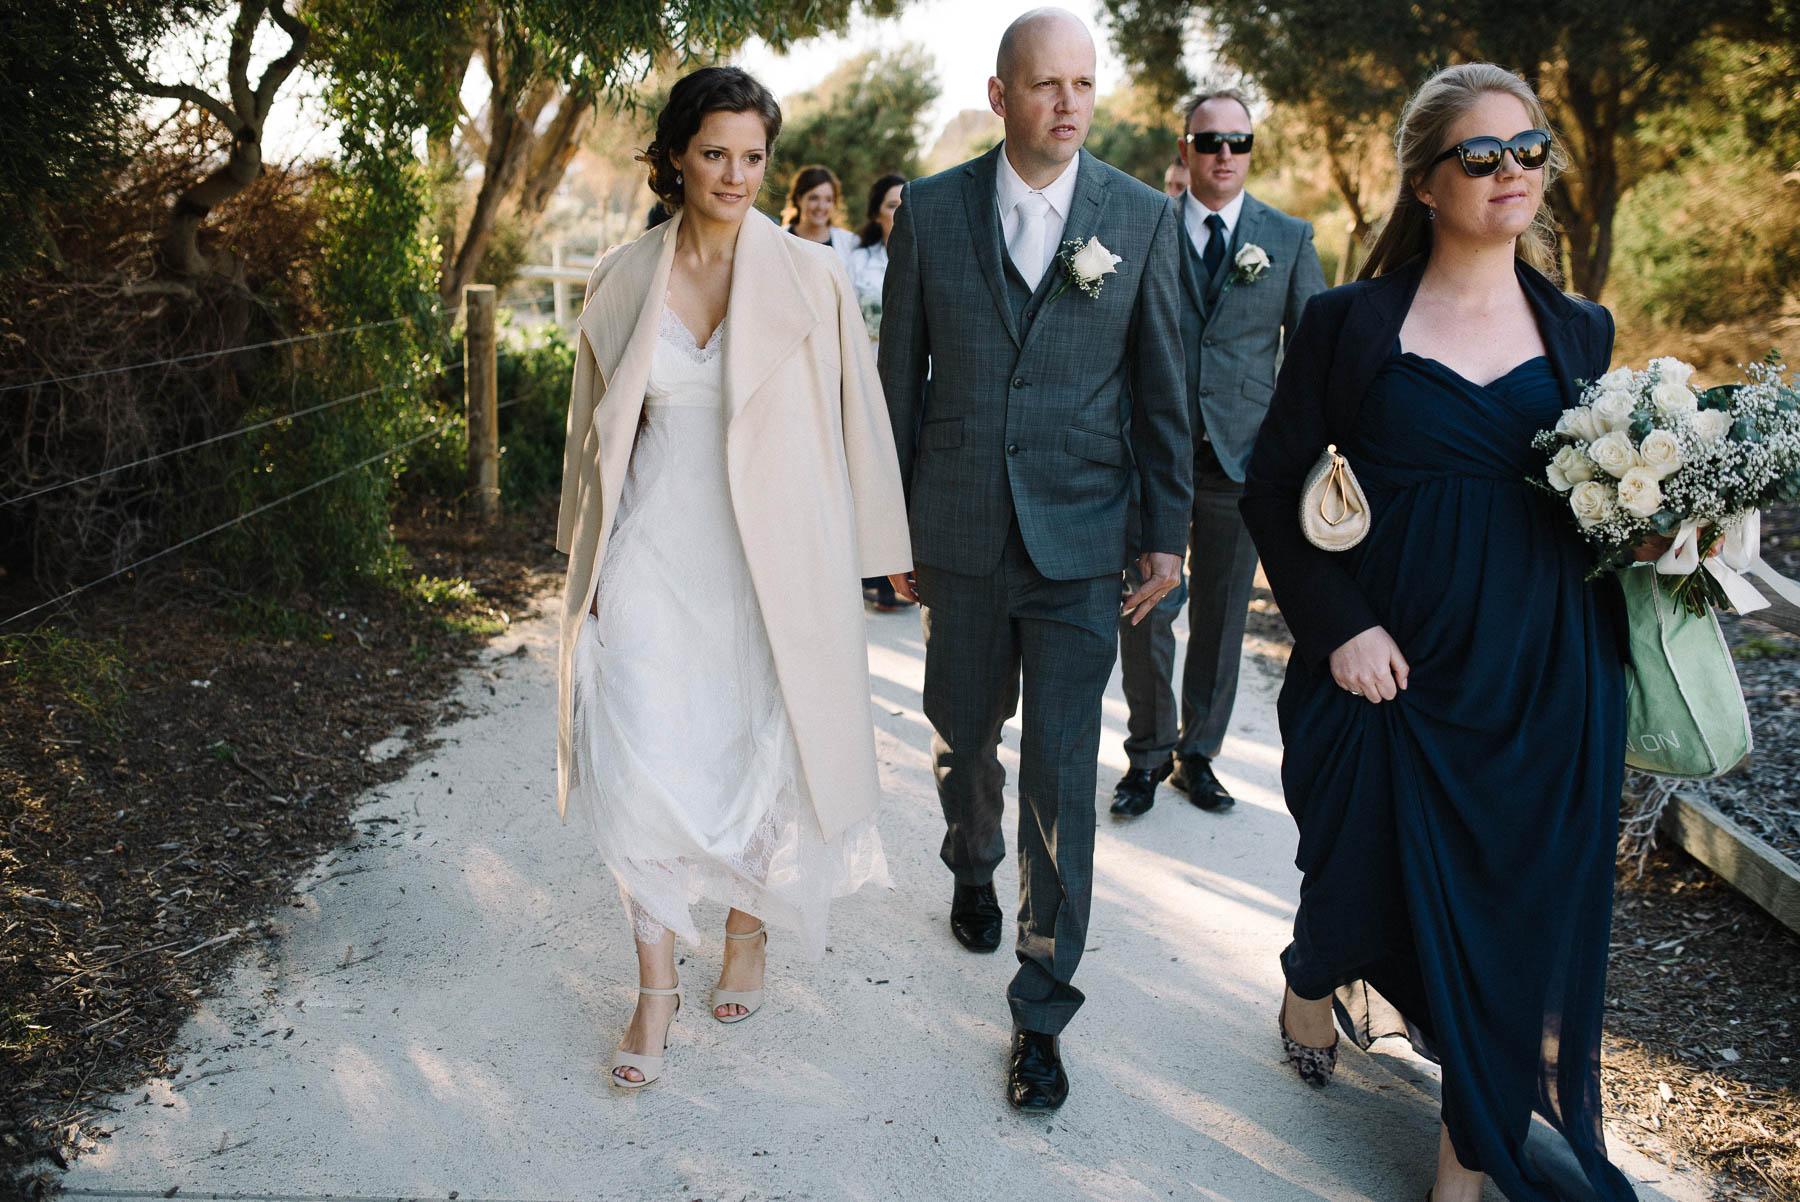 58-candid wedding photographer perth.jpg